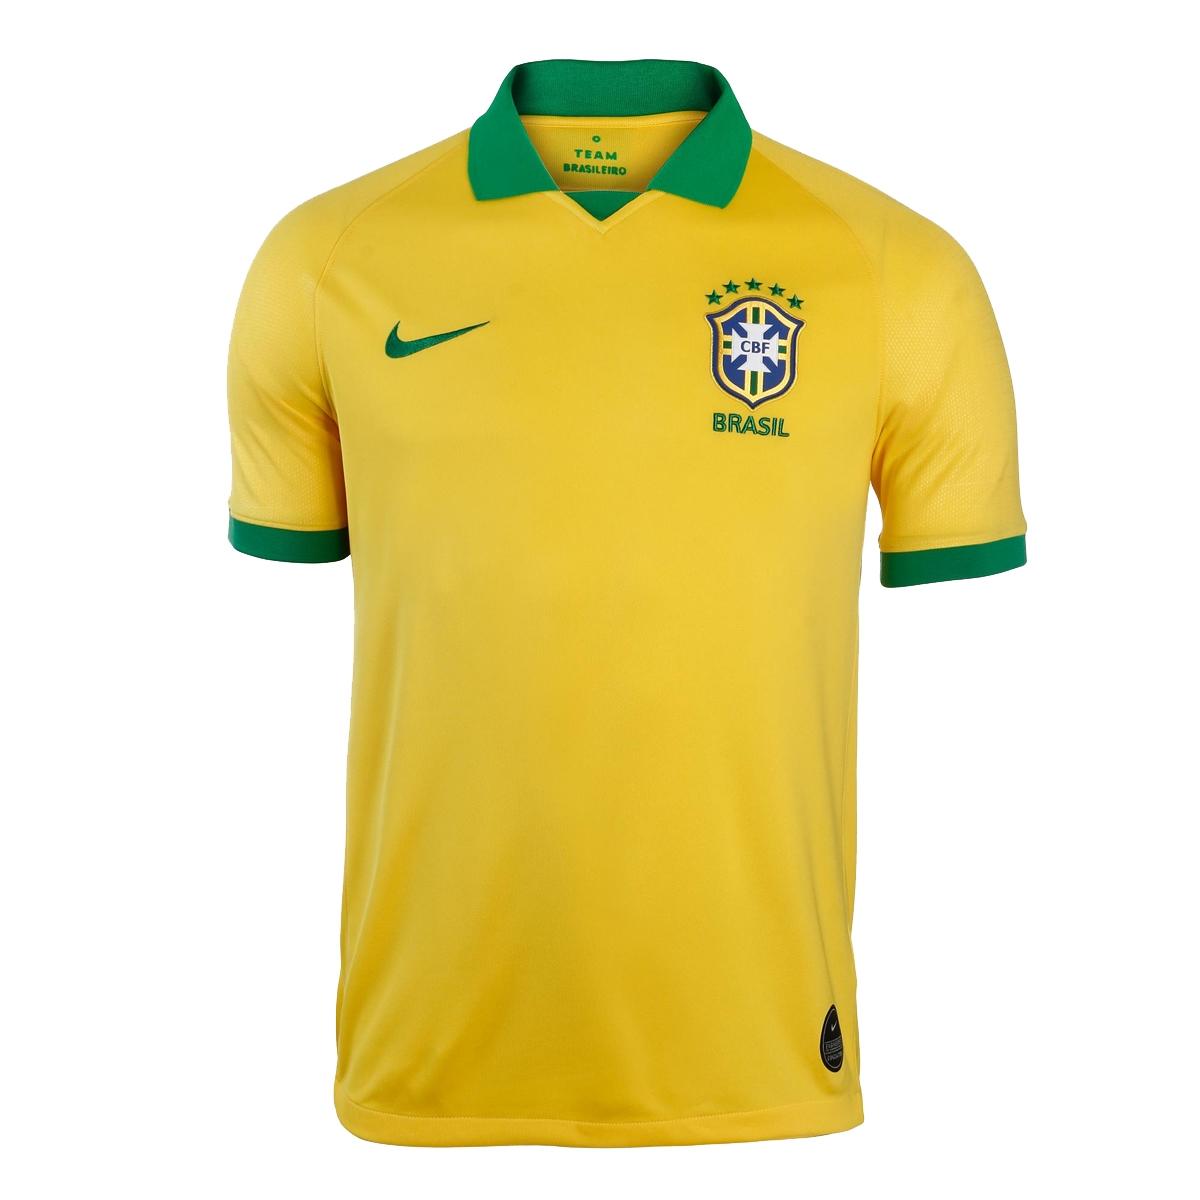 ac5fb2b60aa03 Camisa Nike Brasil Comemorativa Copa América 2019 Torcedor Masculina Amarela